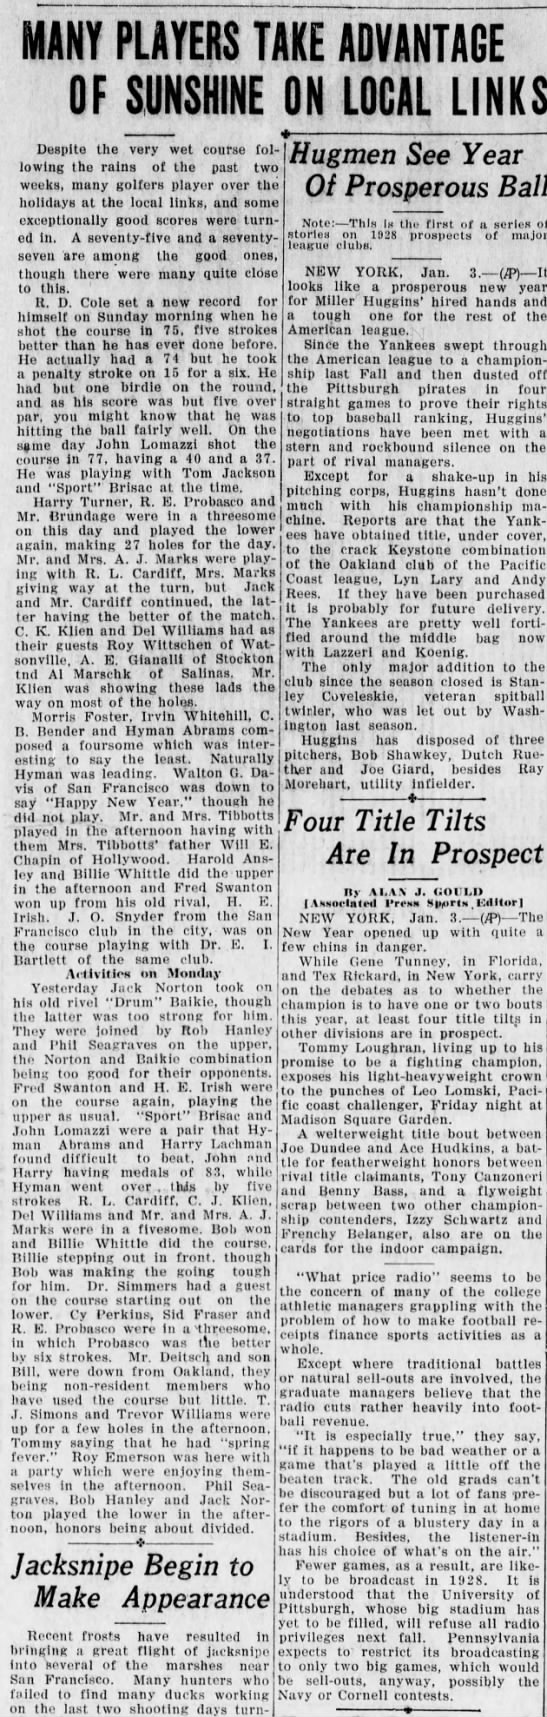 1928 Jan 3 H E Irish - Santa Cruz Evening News - Golfing - . -ra -ra MANY PLAYERS TAKE ADVANTAGE OF...